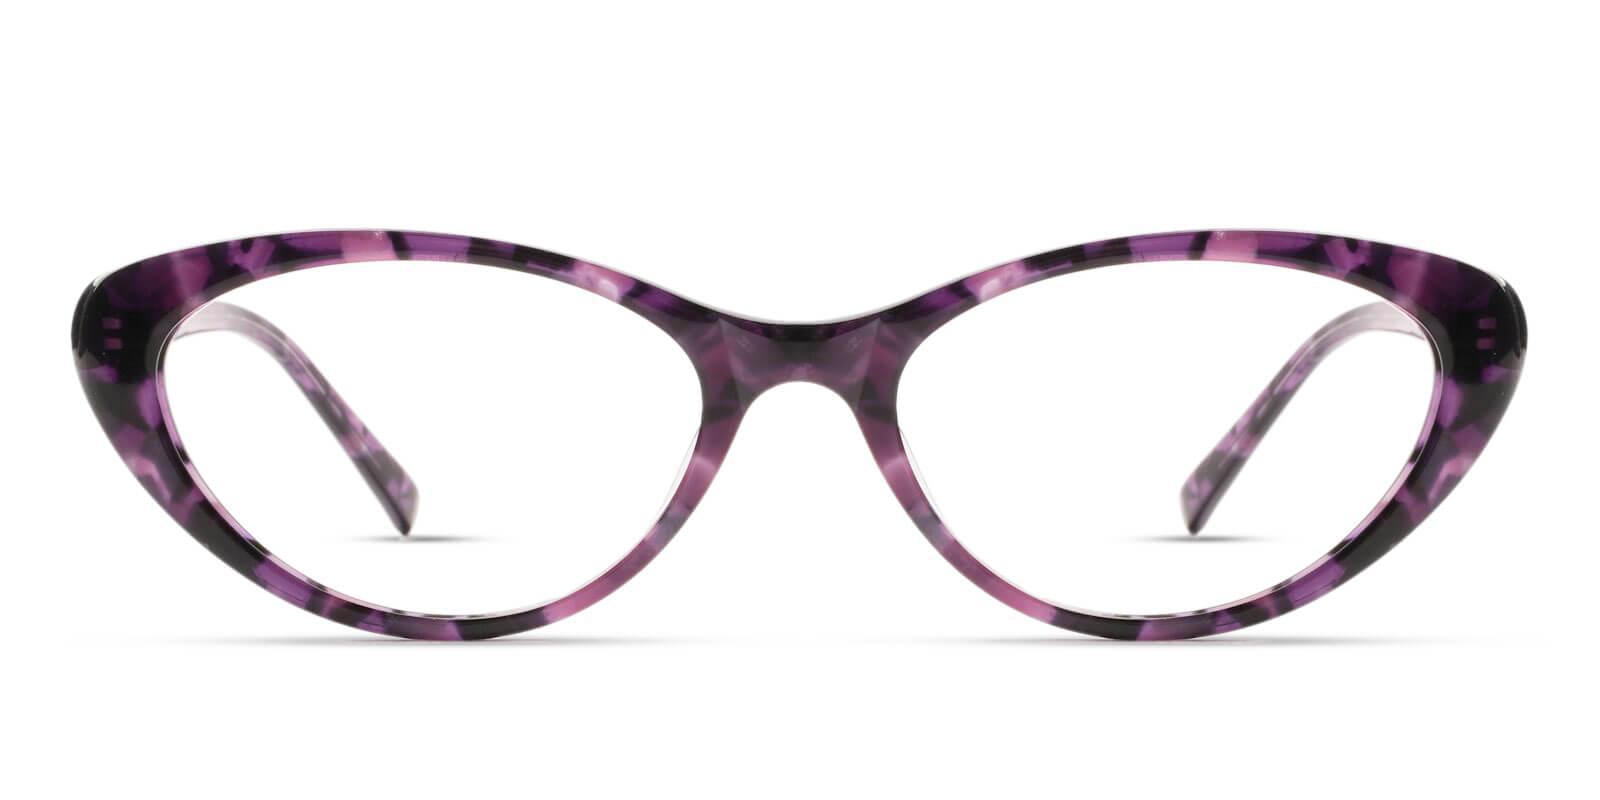 Elena Purple Acetate Eyeglasses , UniversalBridgeFit Frames from ABBE Glasses